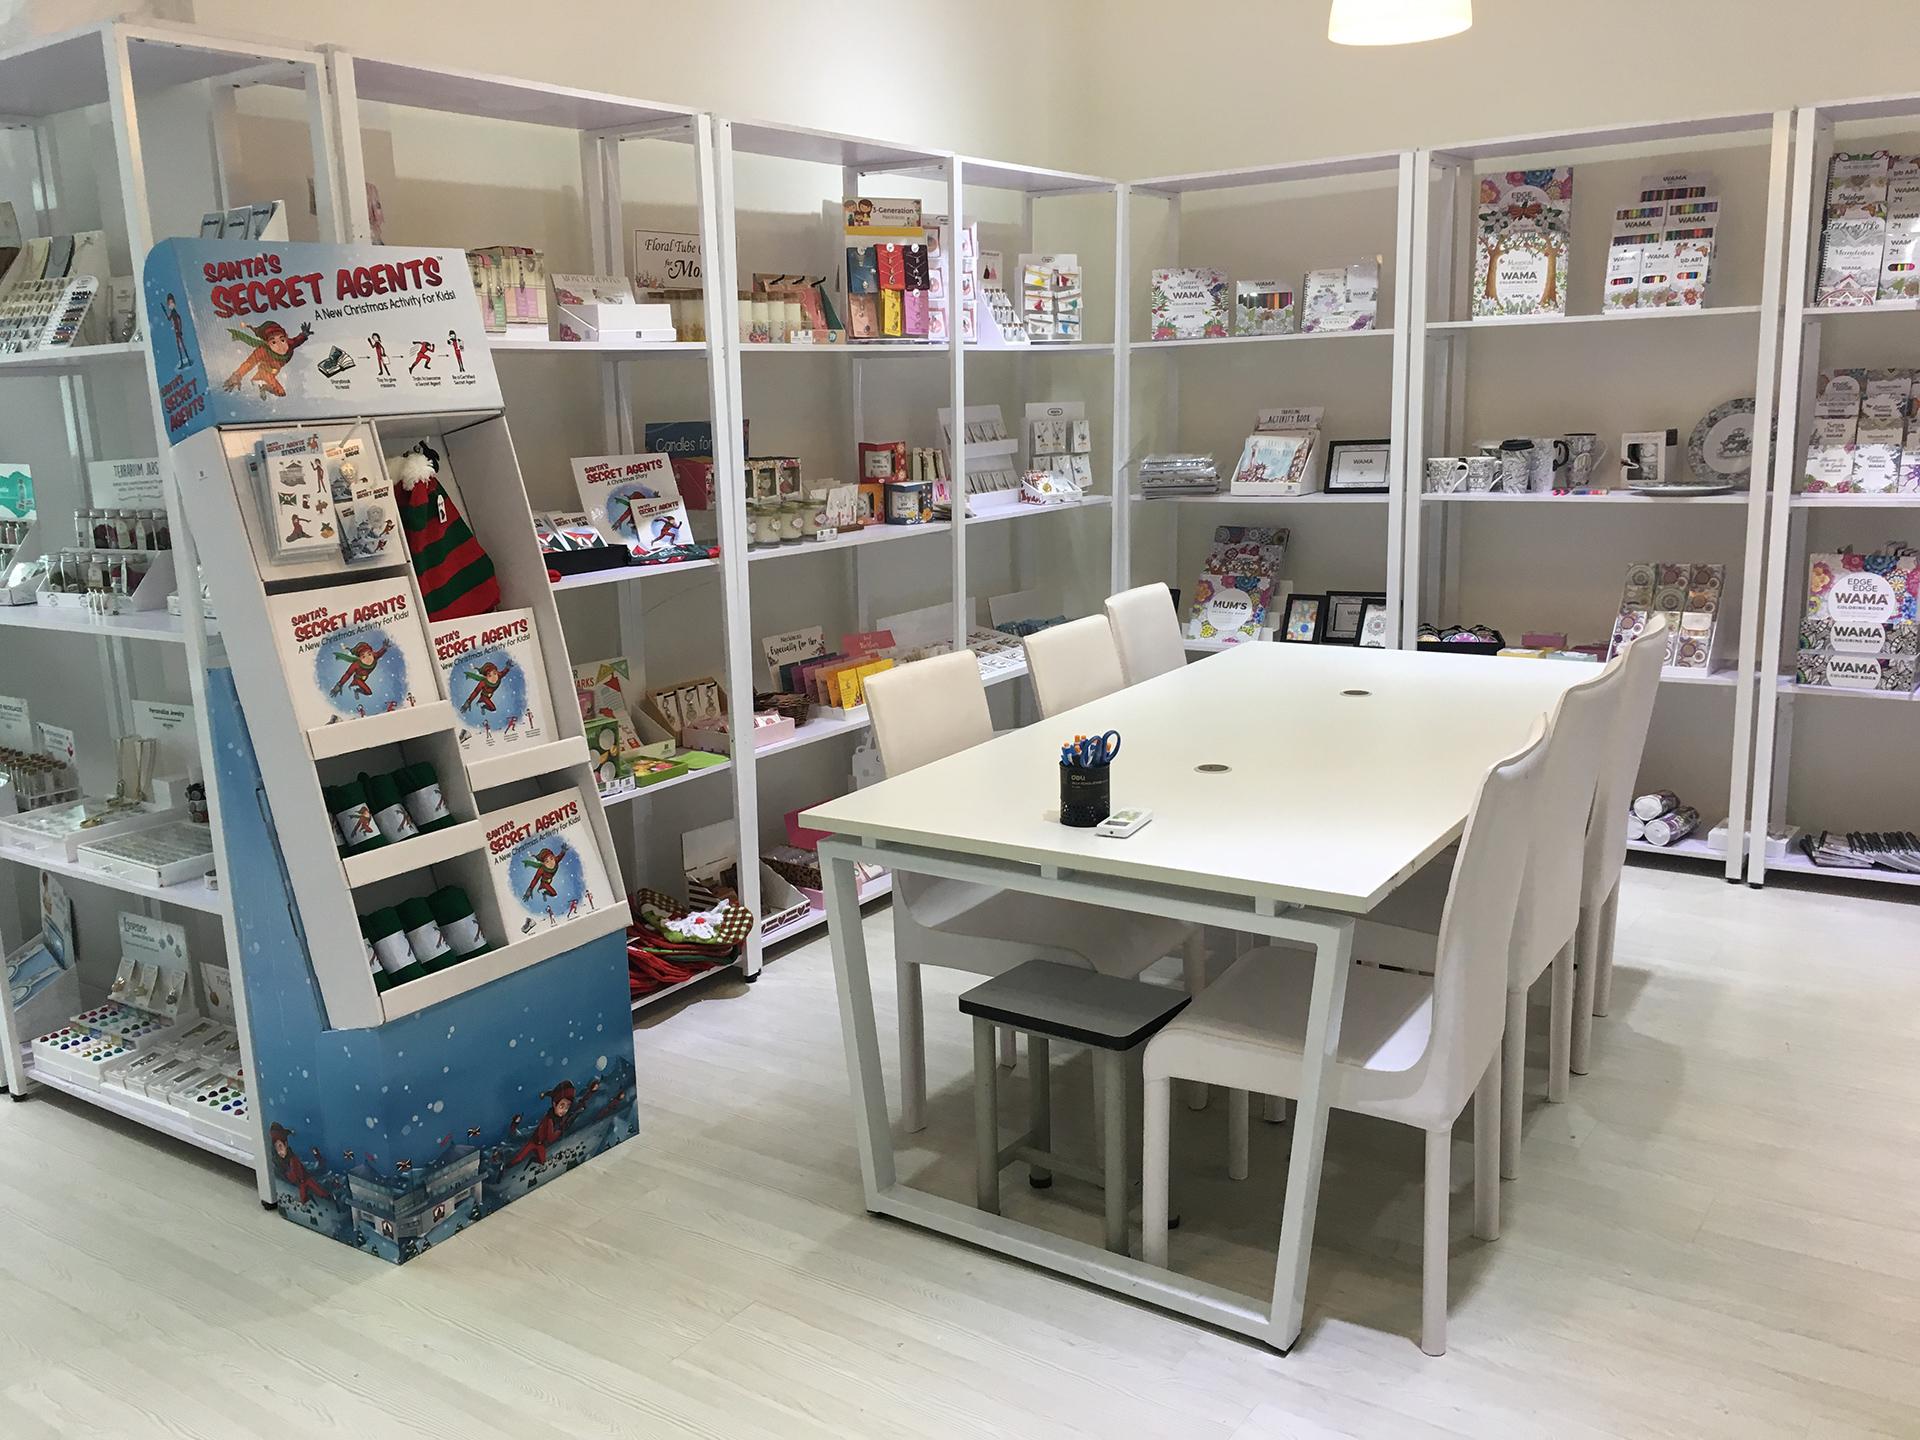 1000 Miles company showroom, featuring WAMA coloring books and Santa's secret agents